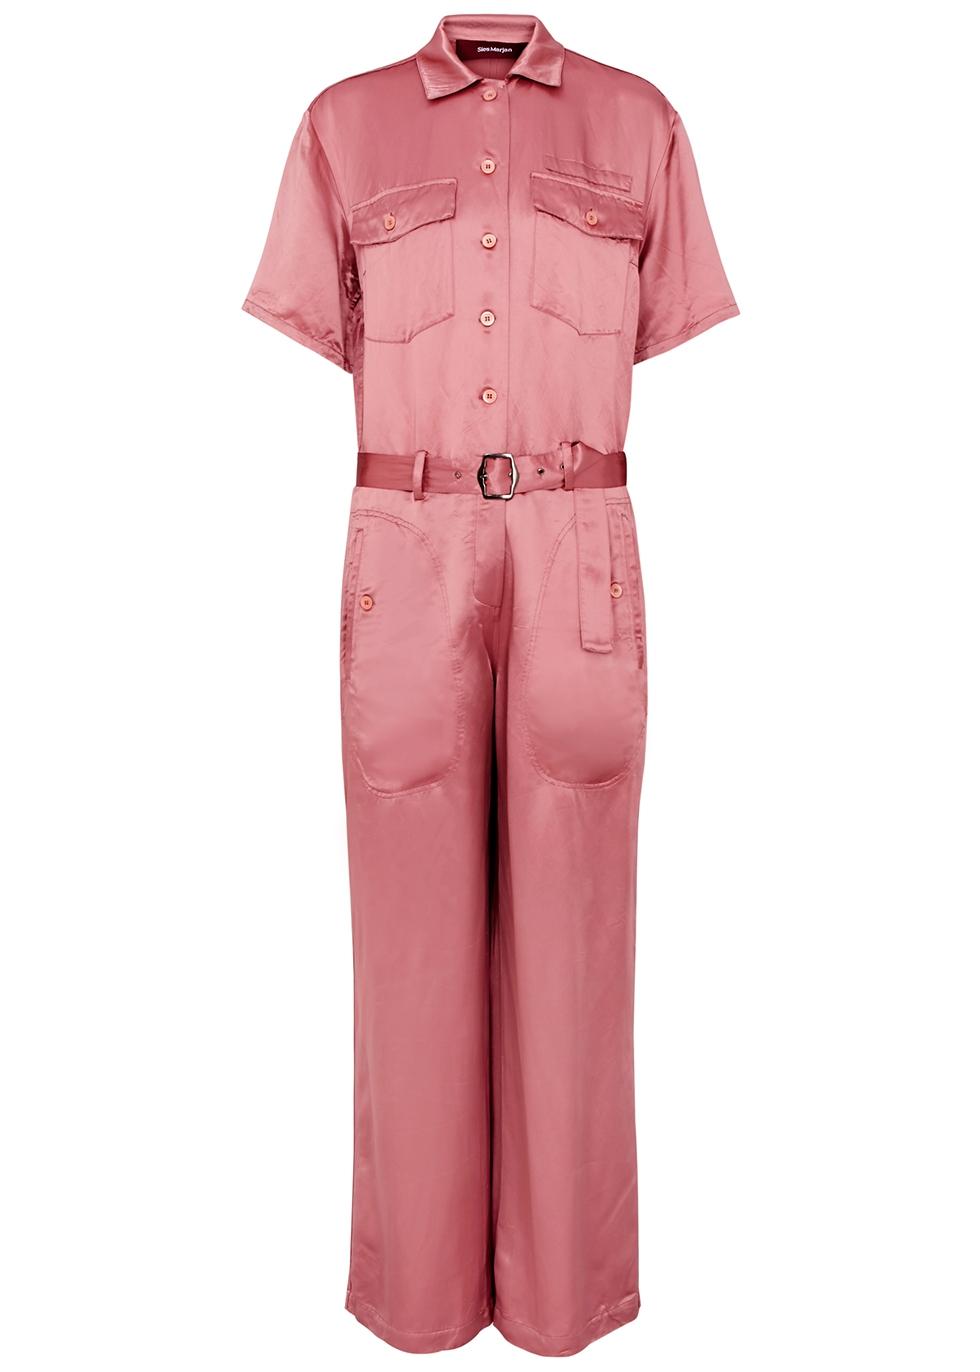 96e9ea2e2e Designer jumpsuits luxury brands harvey nichols jpg 591x827 Wine chiffon  jumpsuits